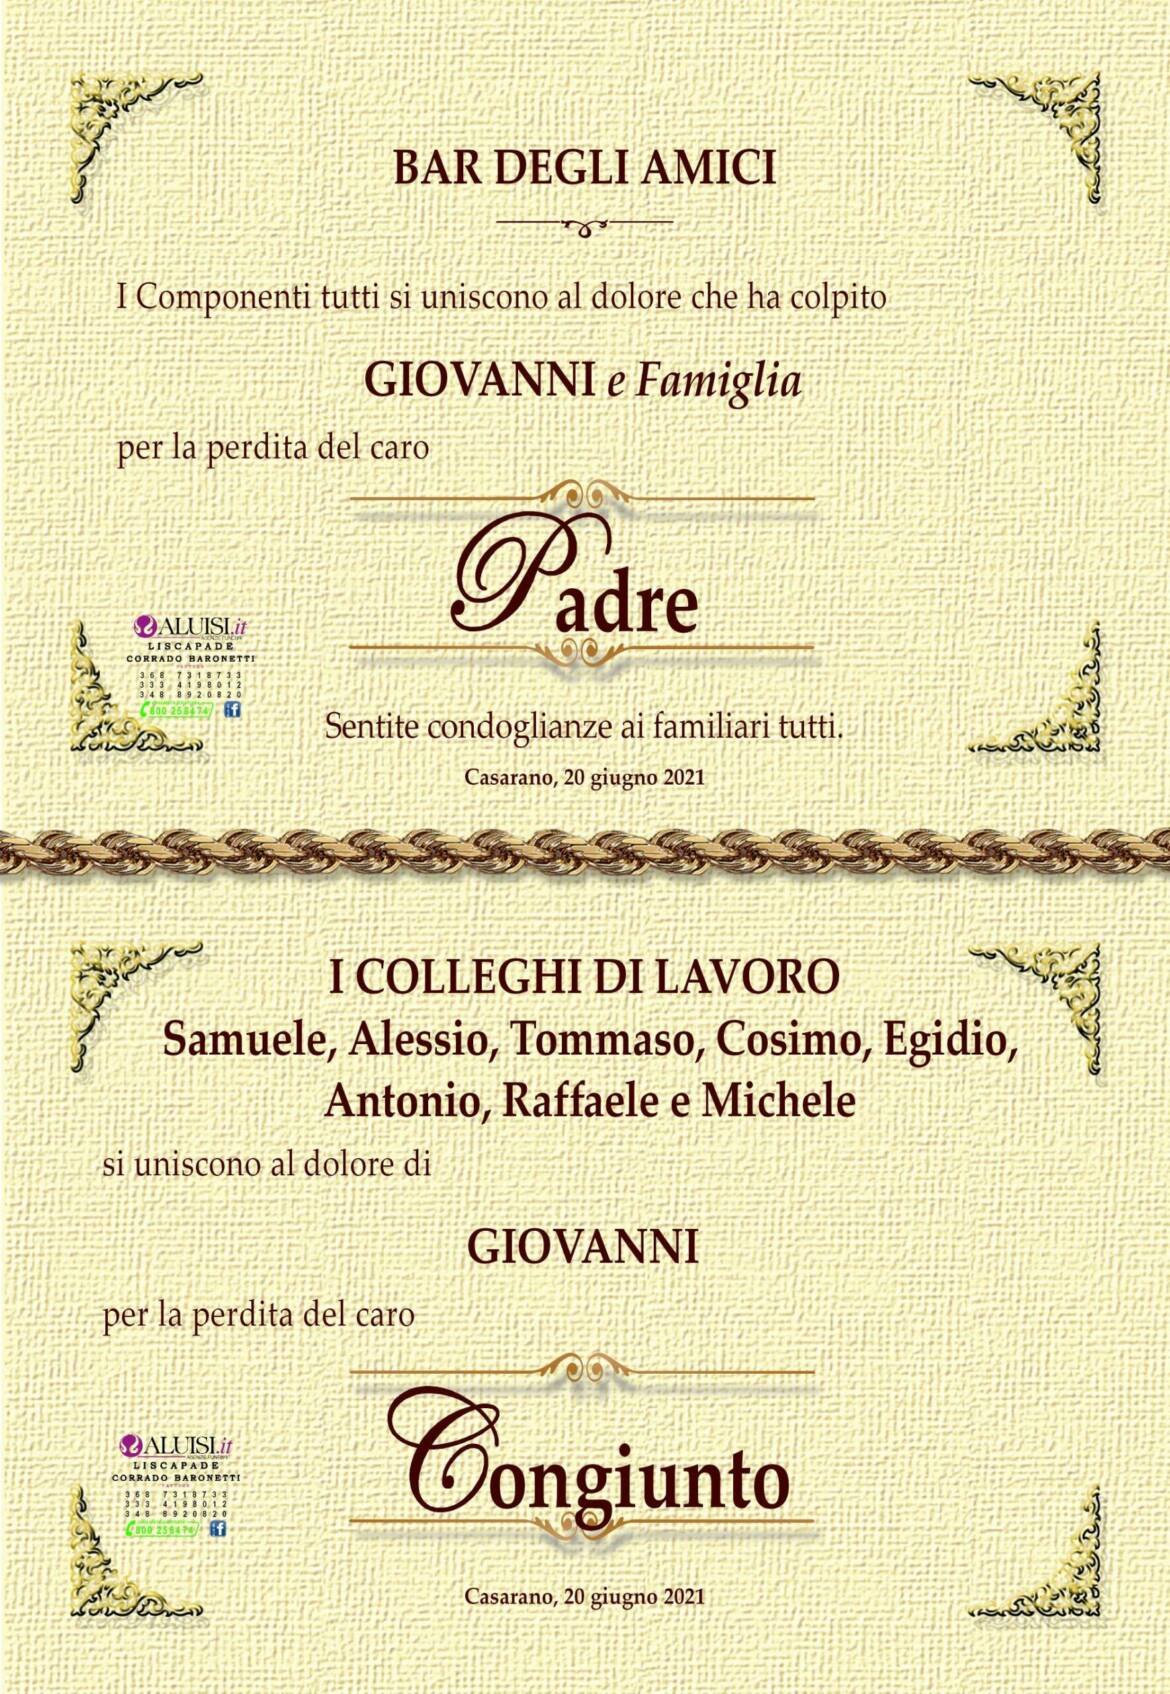 PARTECIPAZIONI-LUIGI-PANTALEO-PRIMICERI-CASARANO-3-2-scaled.jpg